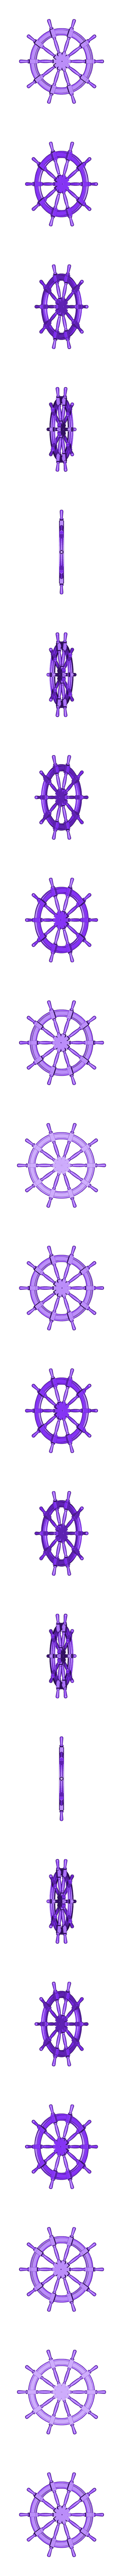 WHEEL-x2.stl Download STL file Ship's Wheel • 3D printer template, pumpkinhead3d